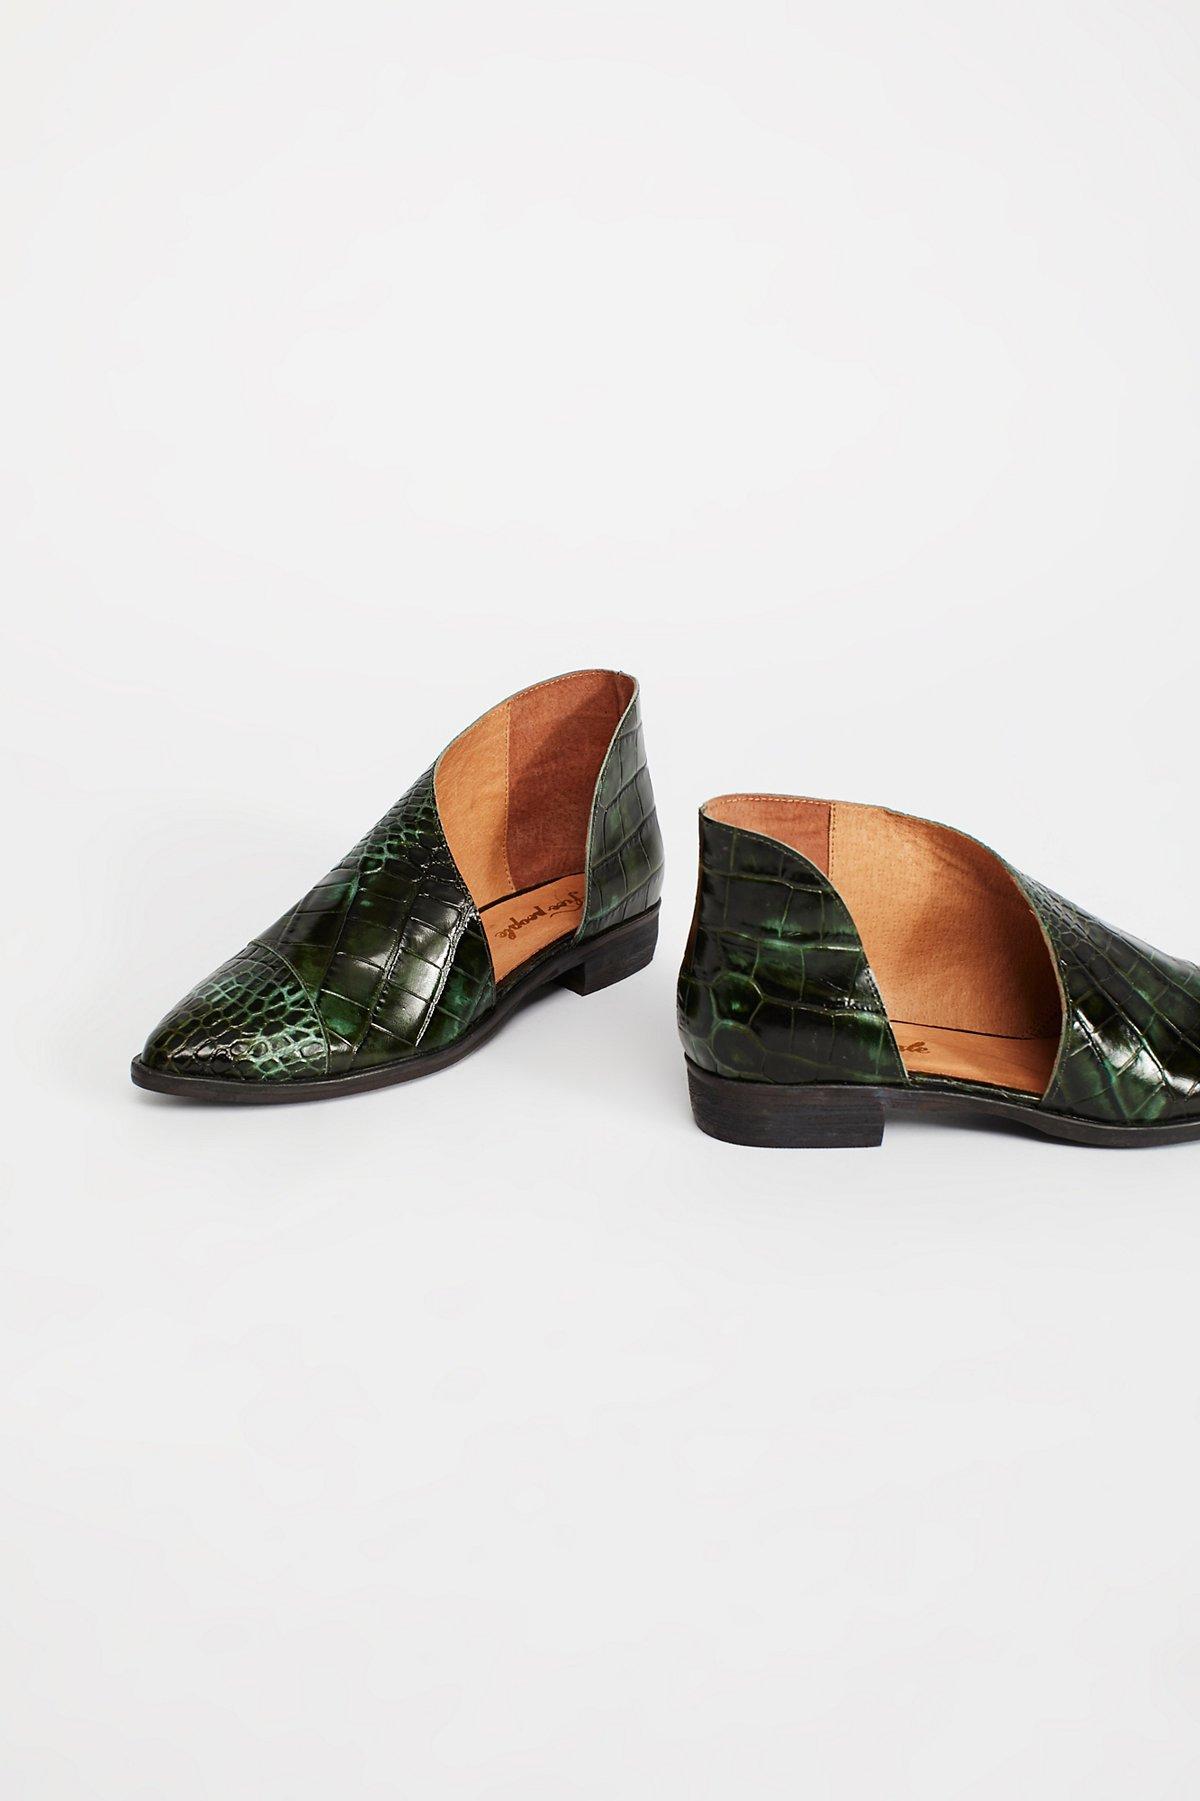 Royale平底鞋